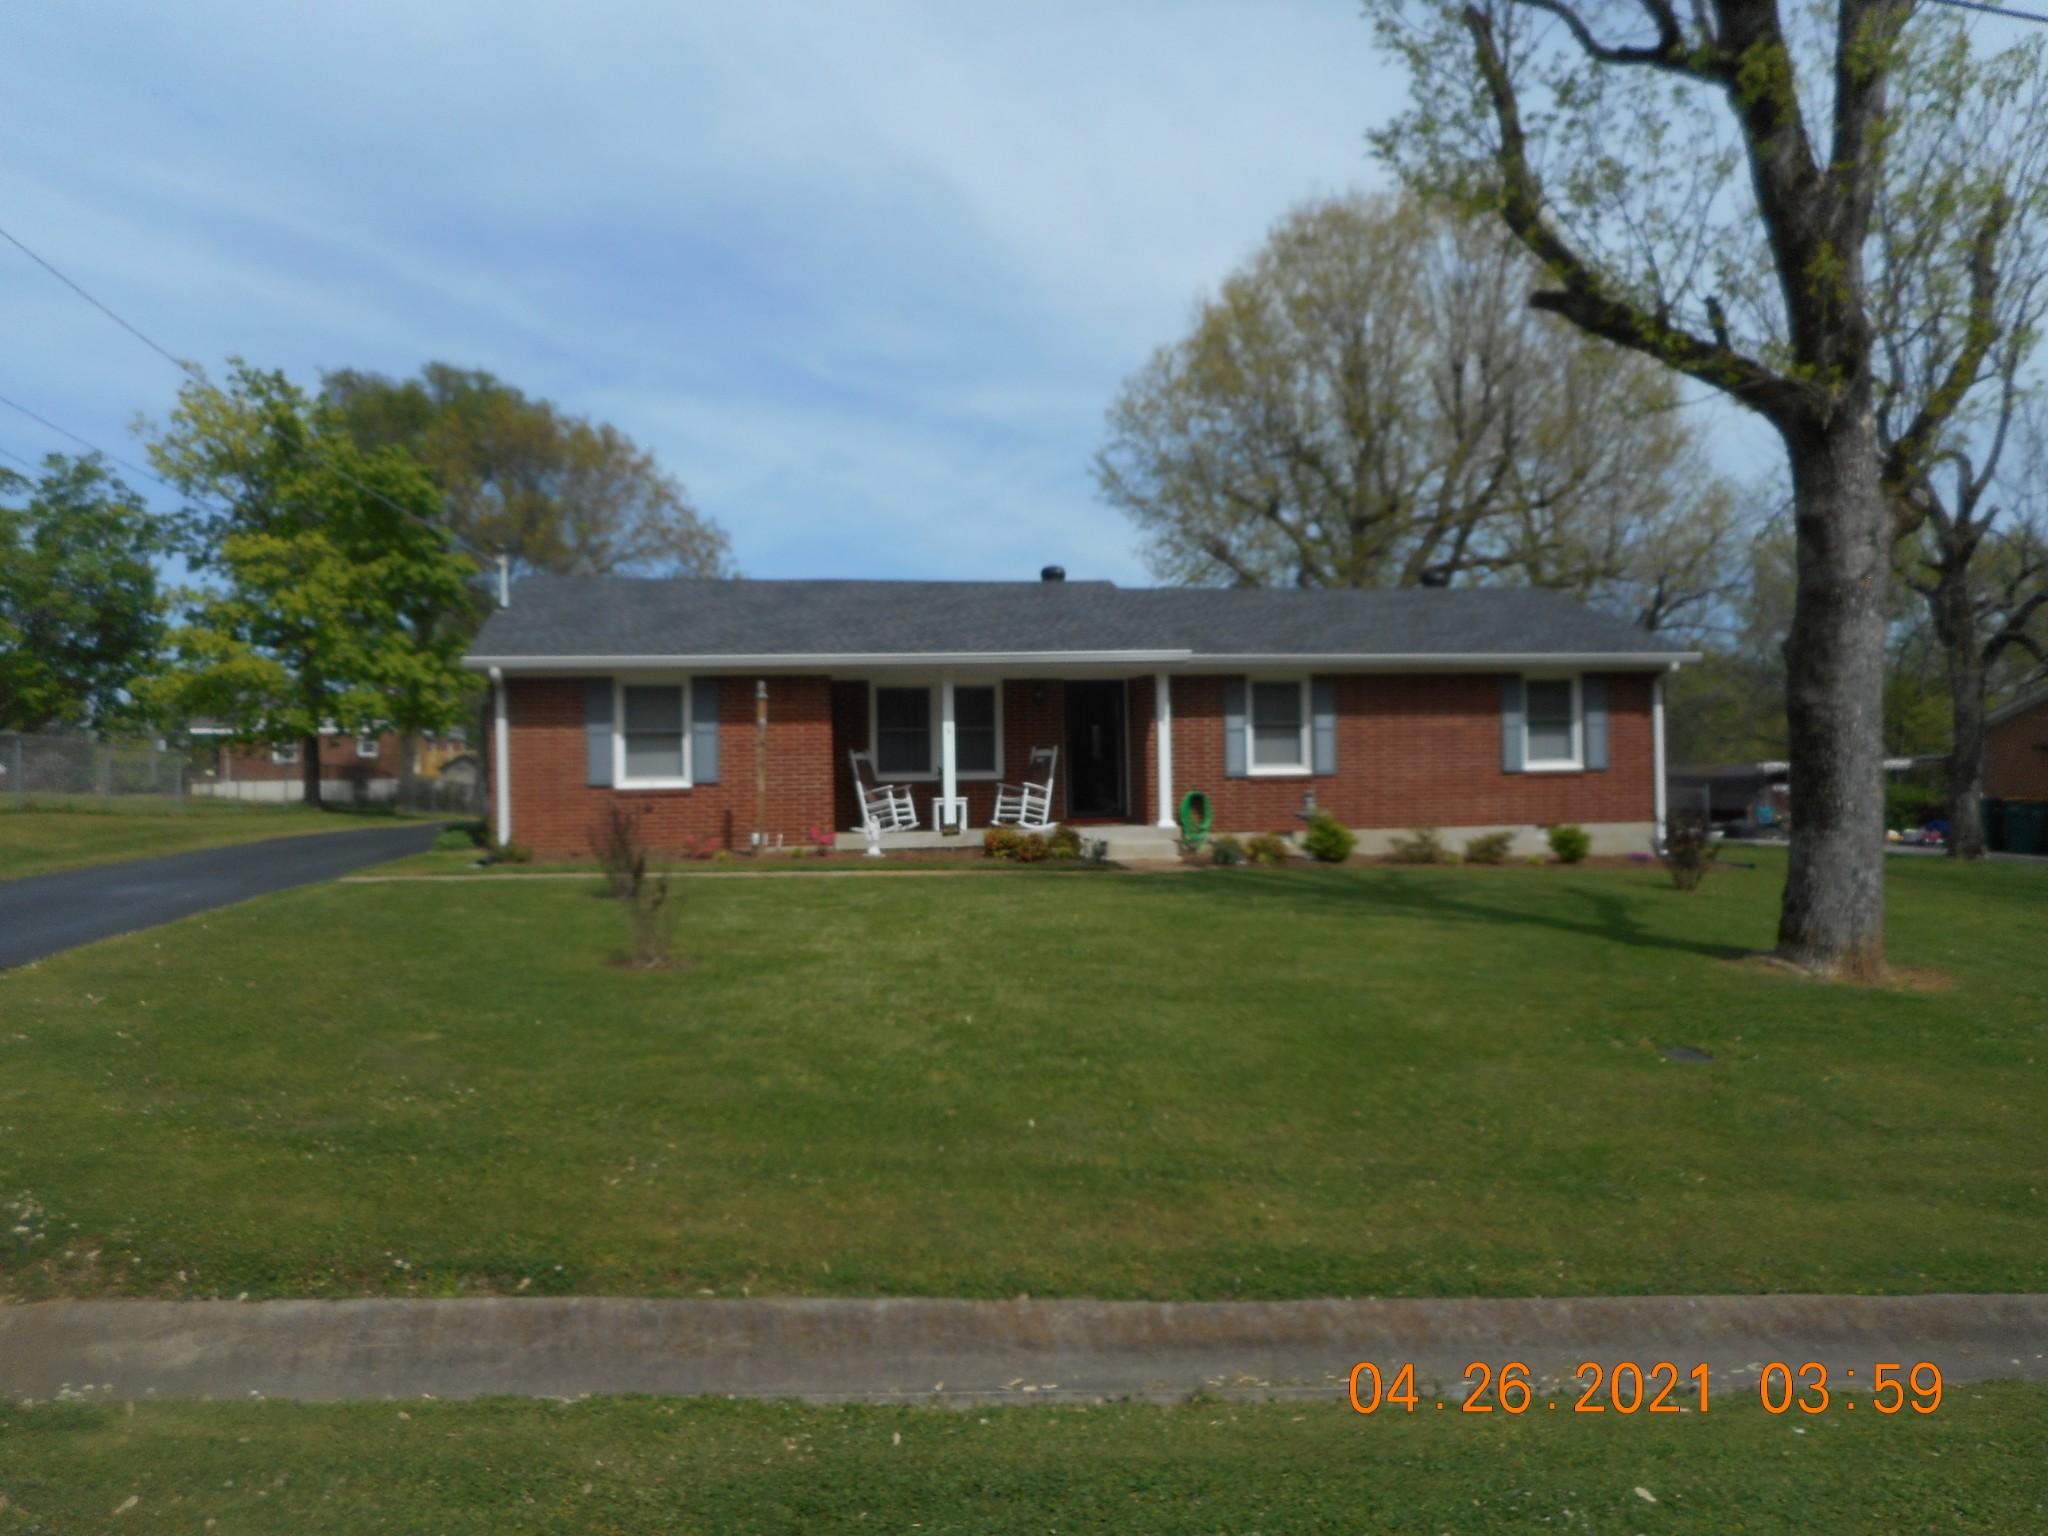 617 Colburn Dr Property Photo - Lewisburg, TN real estate listing